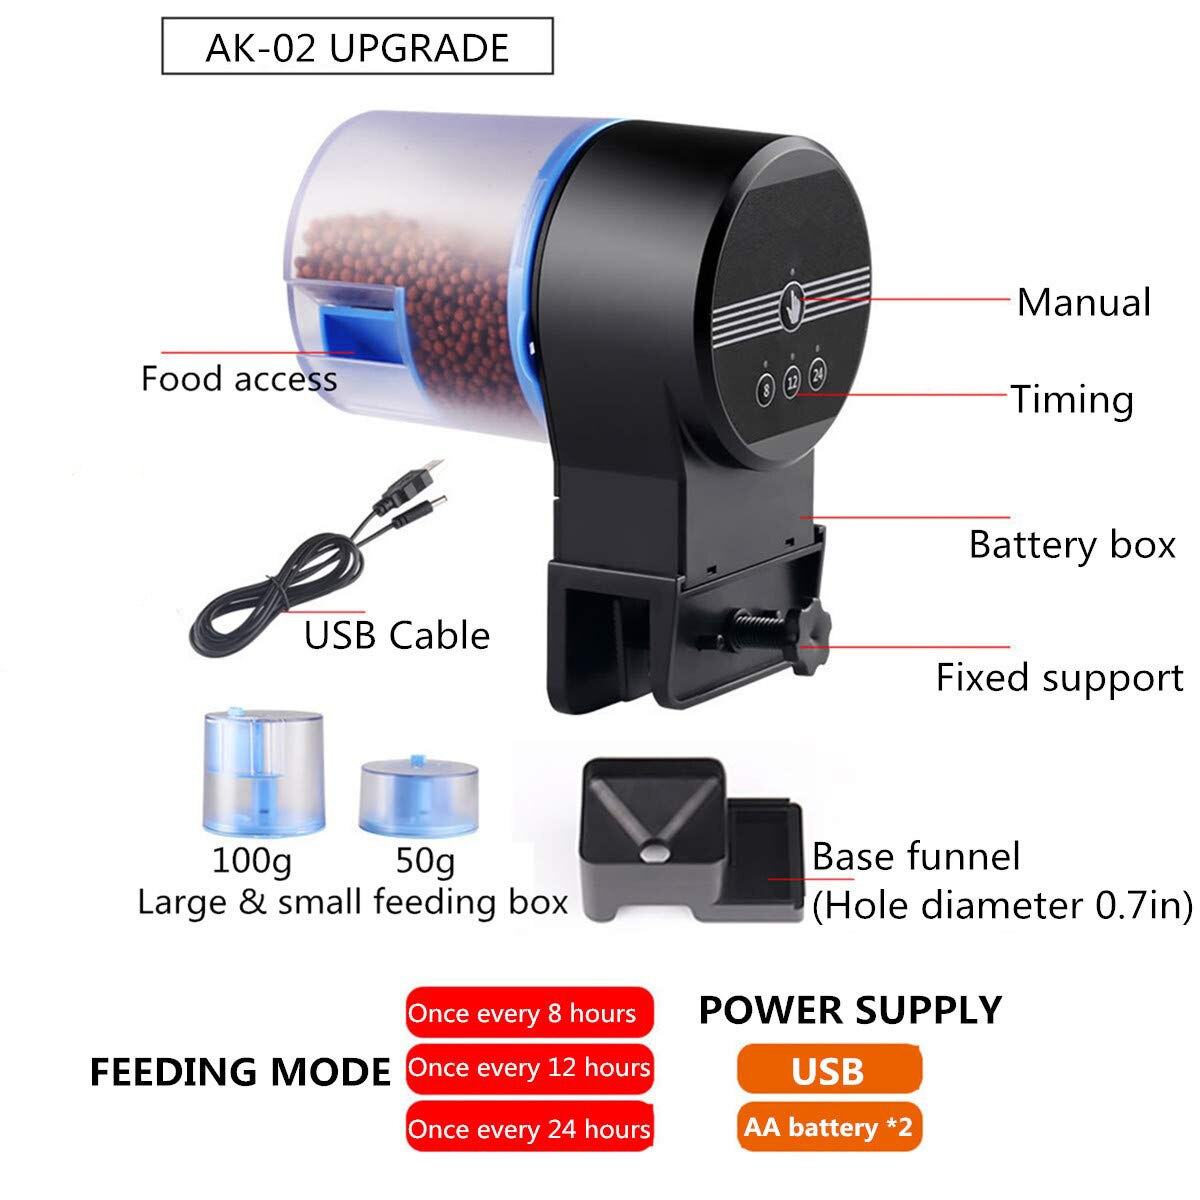 SUNSUN Automatic Fish Feeder Aquarium Tank WIFI Timer Feeders Moisture-Proof Electric Auto Food Dispenser Mobile App Control